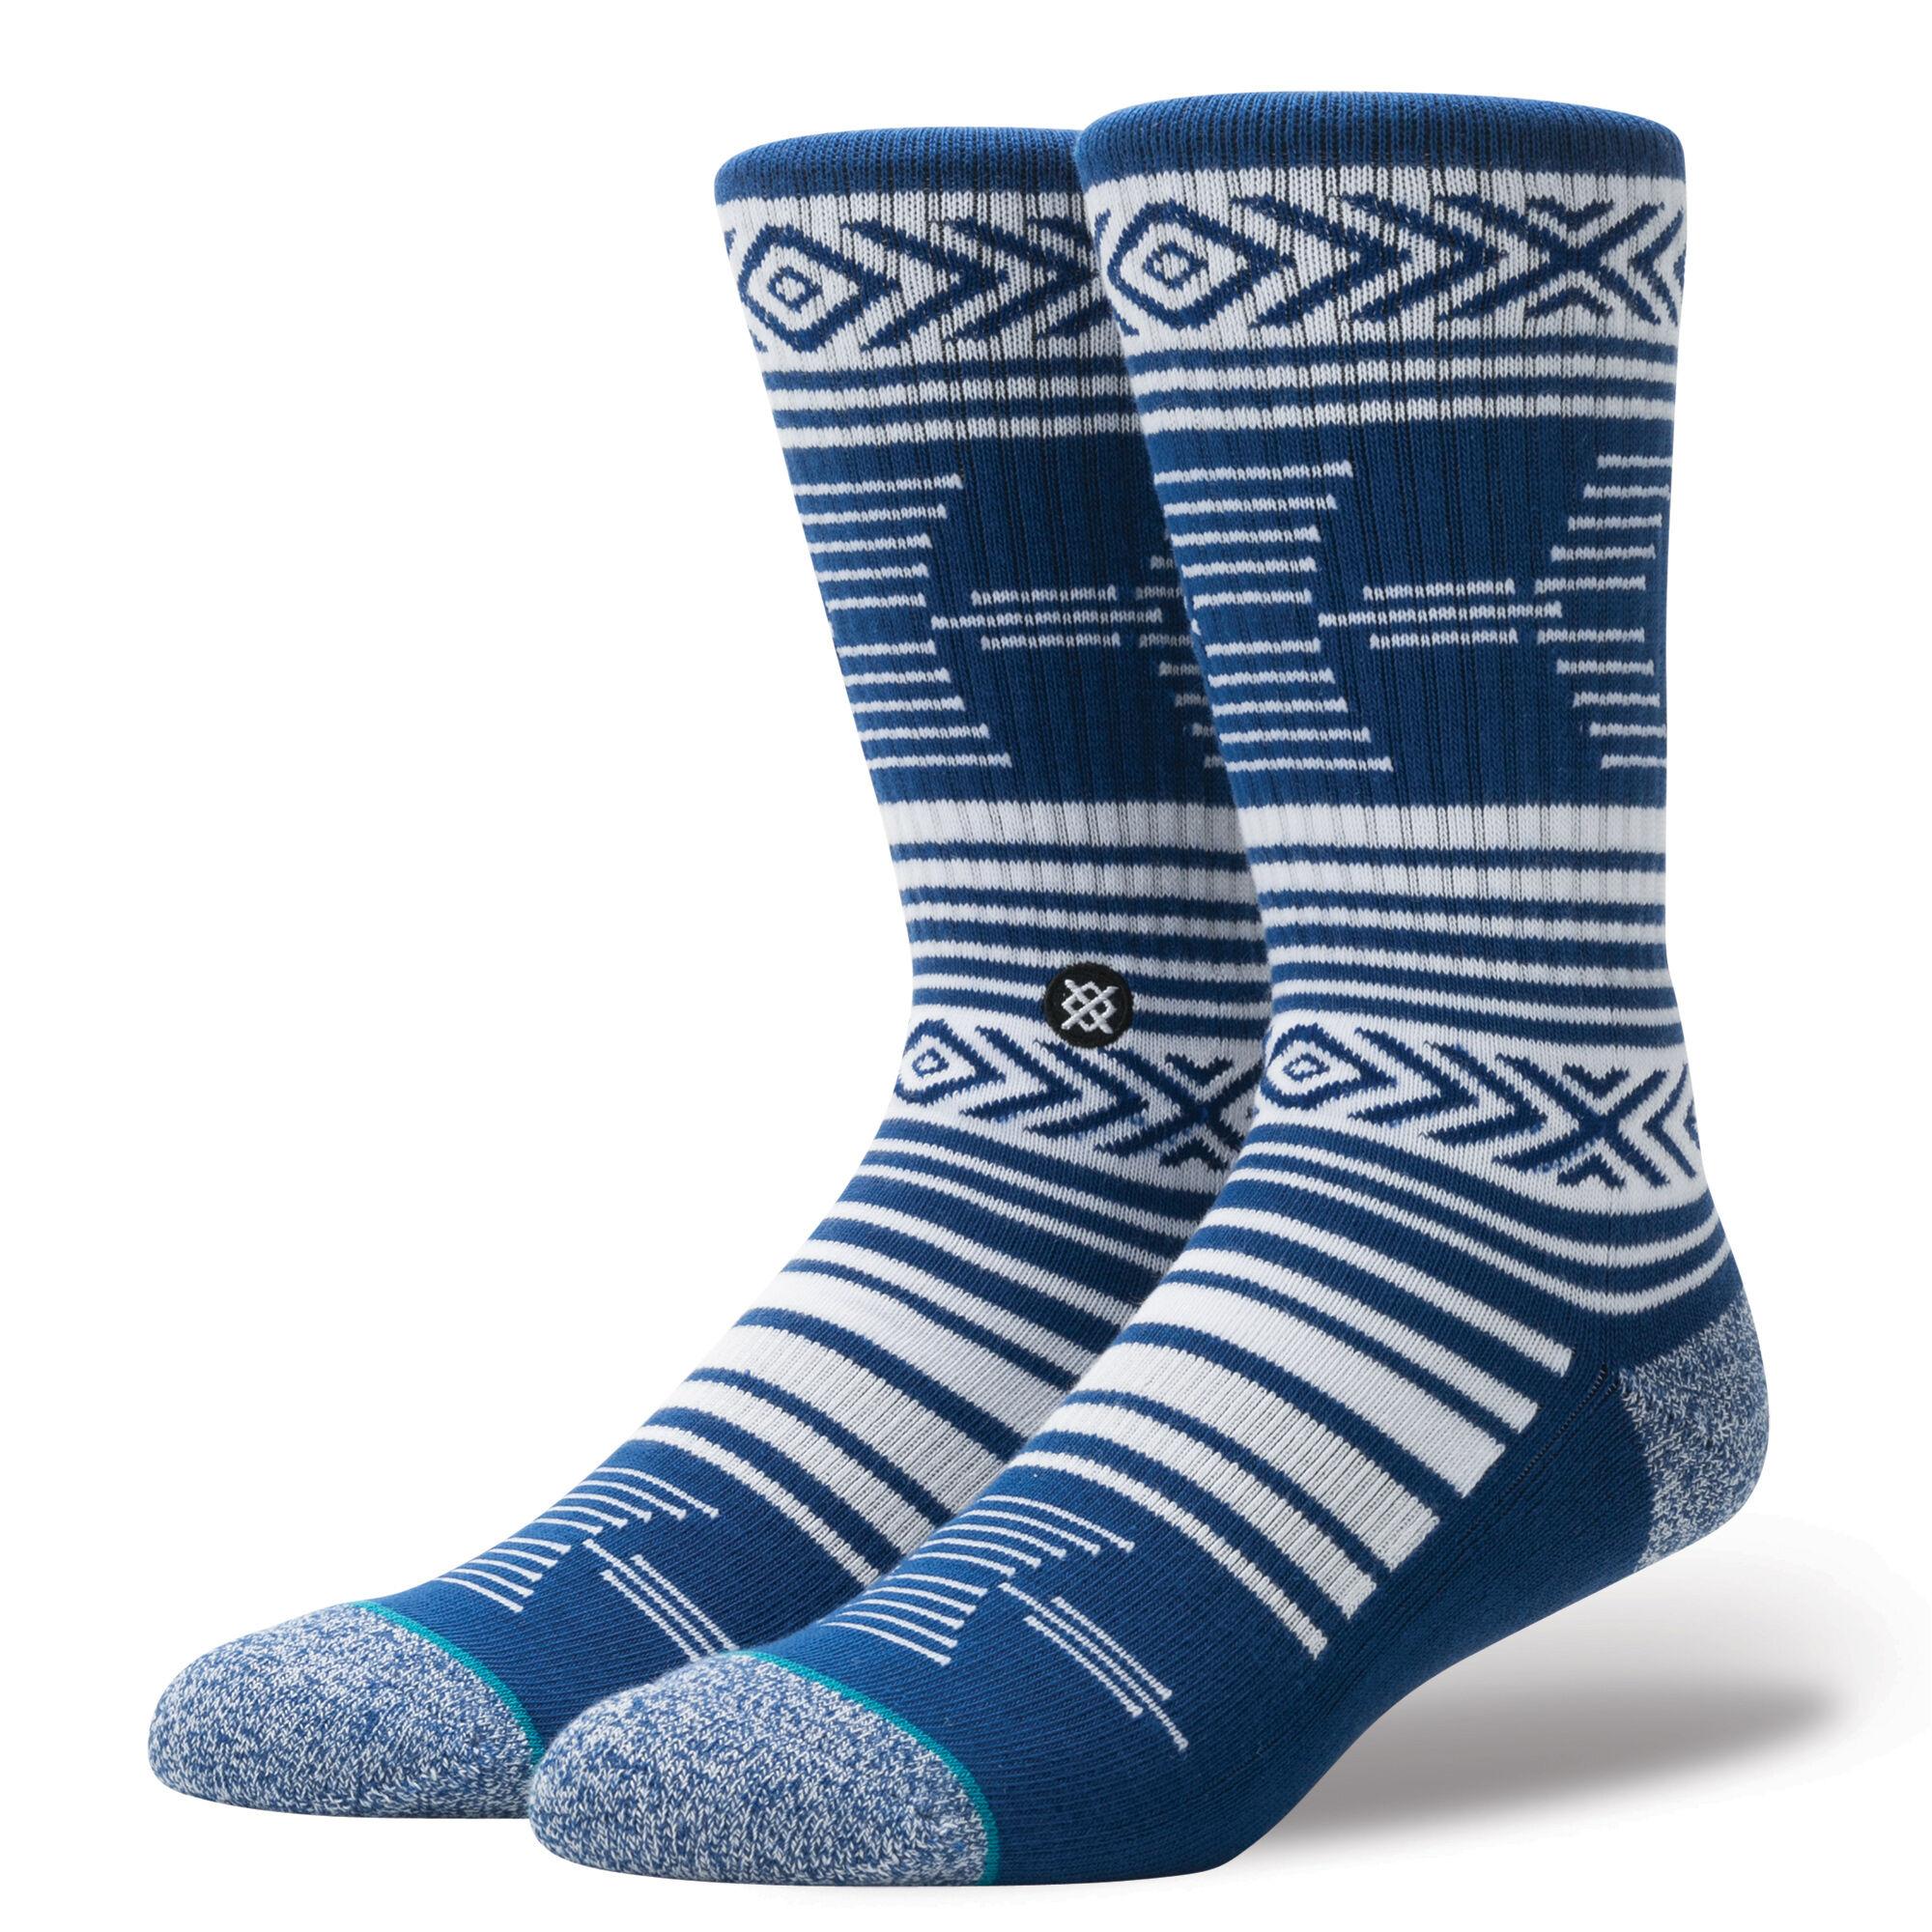 pair of blue and white Stance socks for men